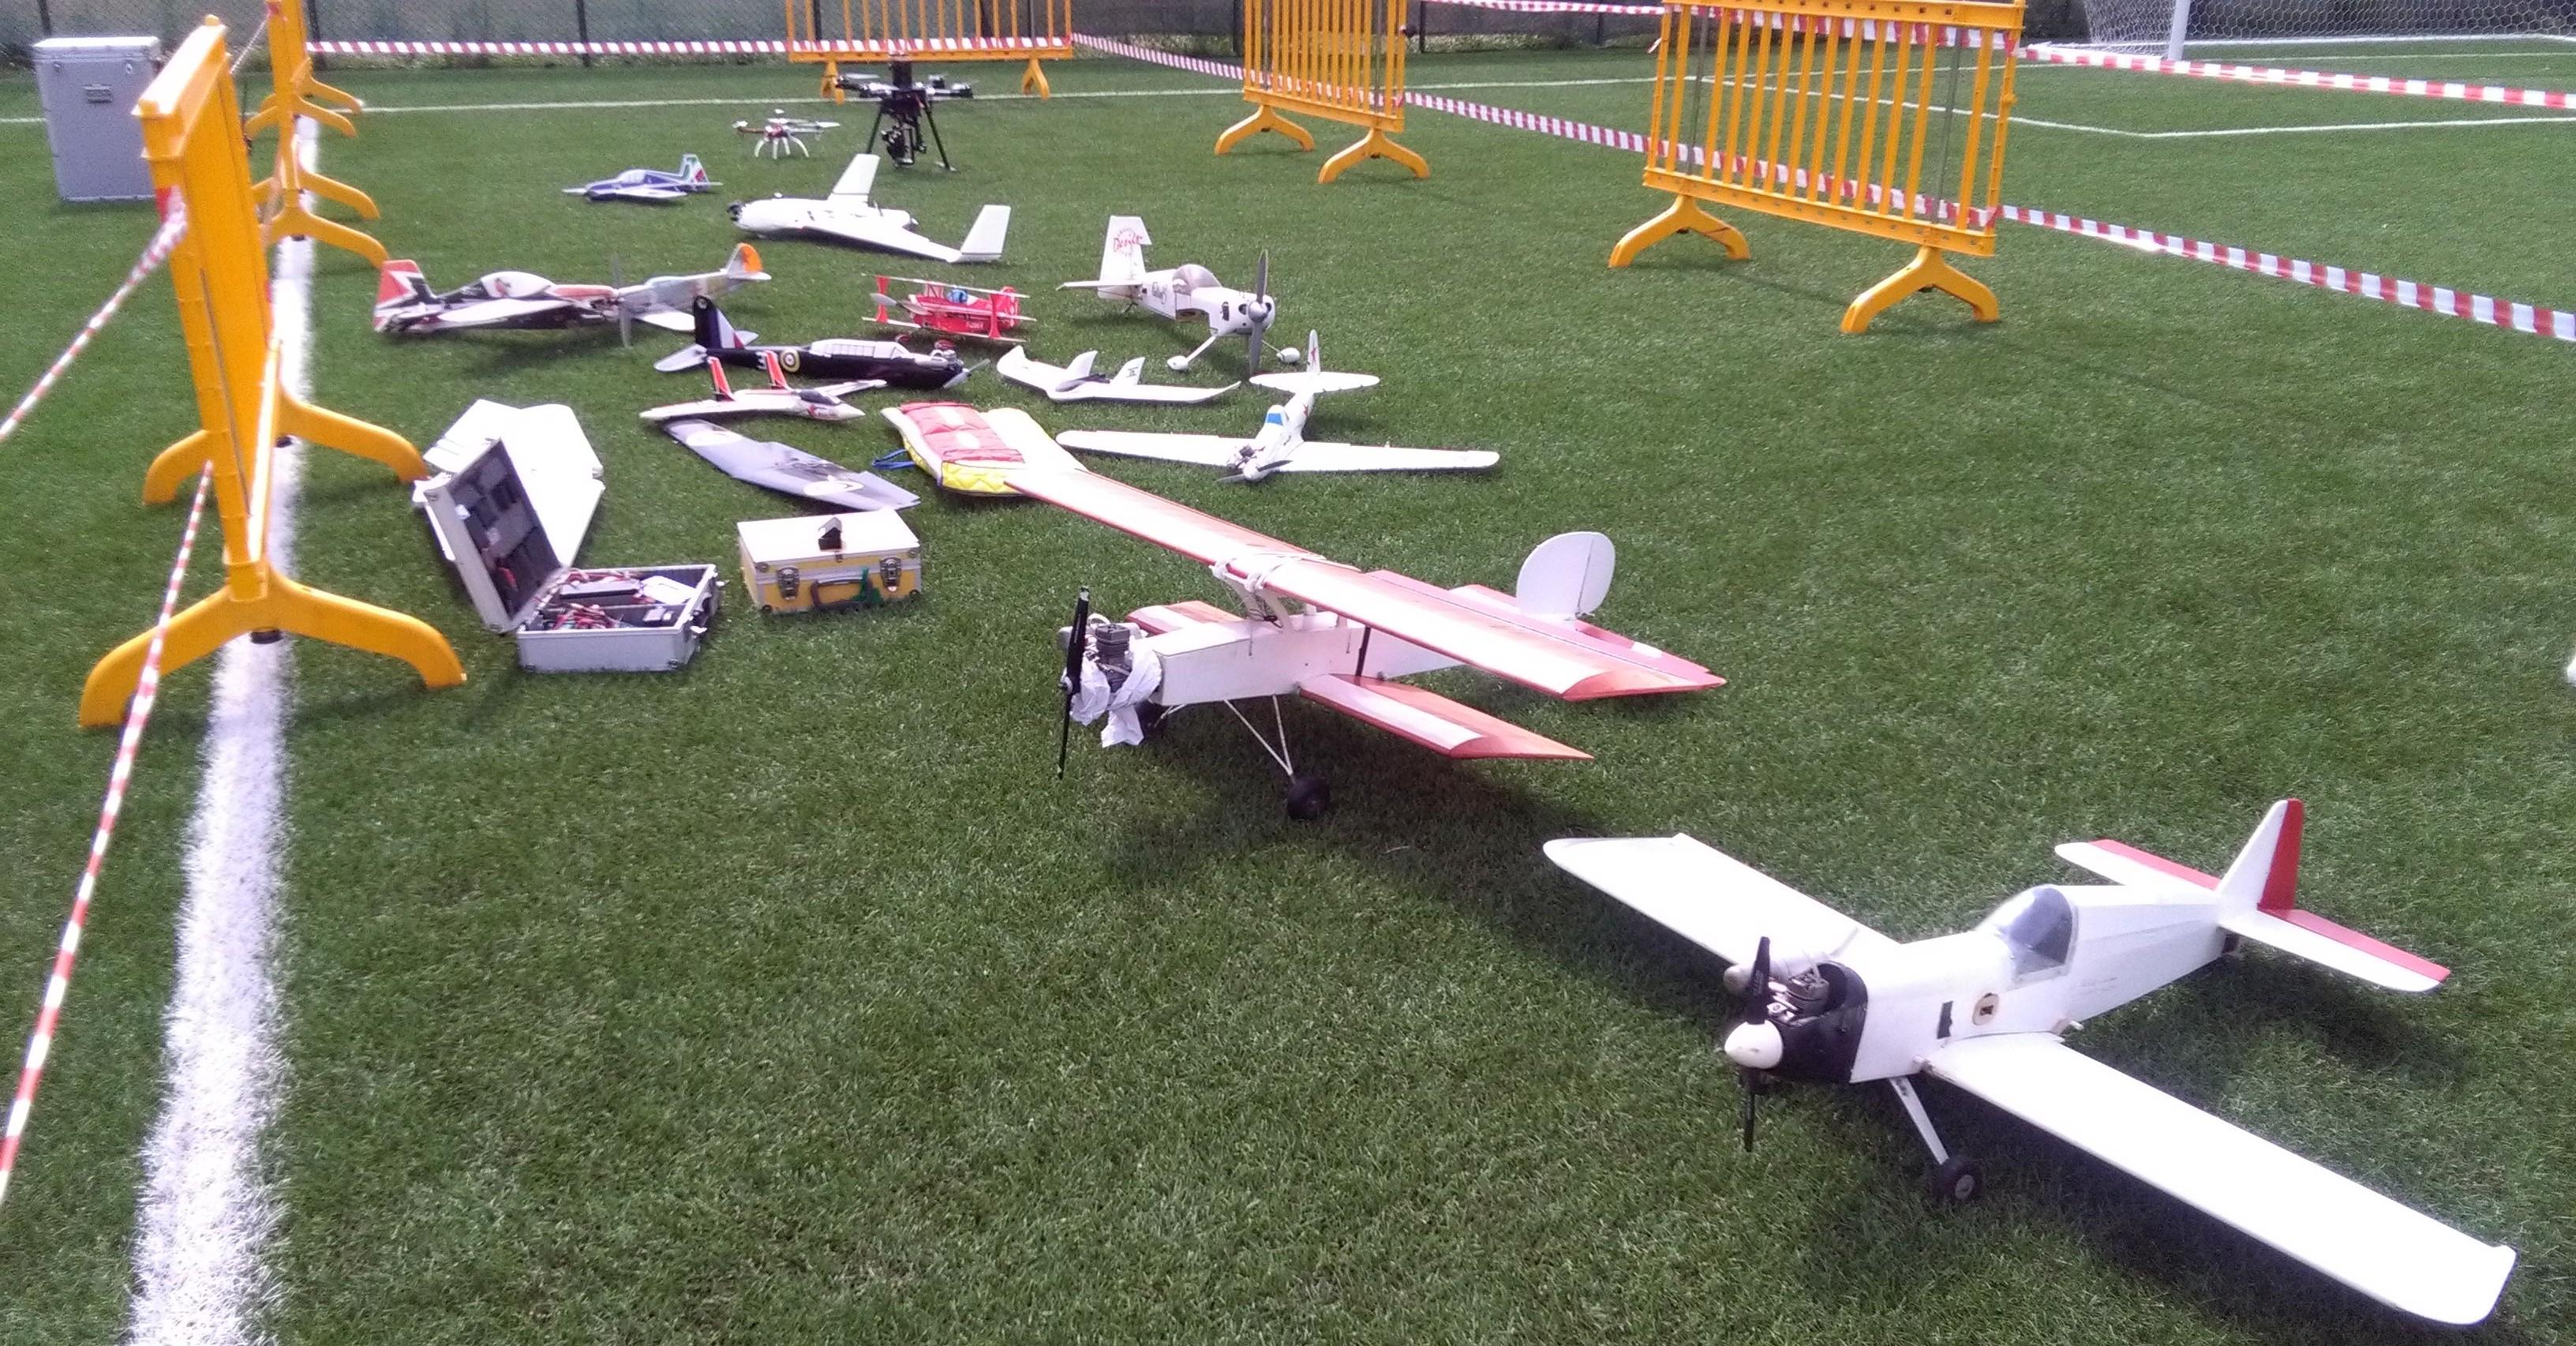 Scuola-aeromodellismo-Castelnuovo